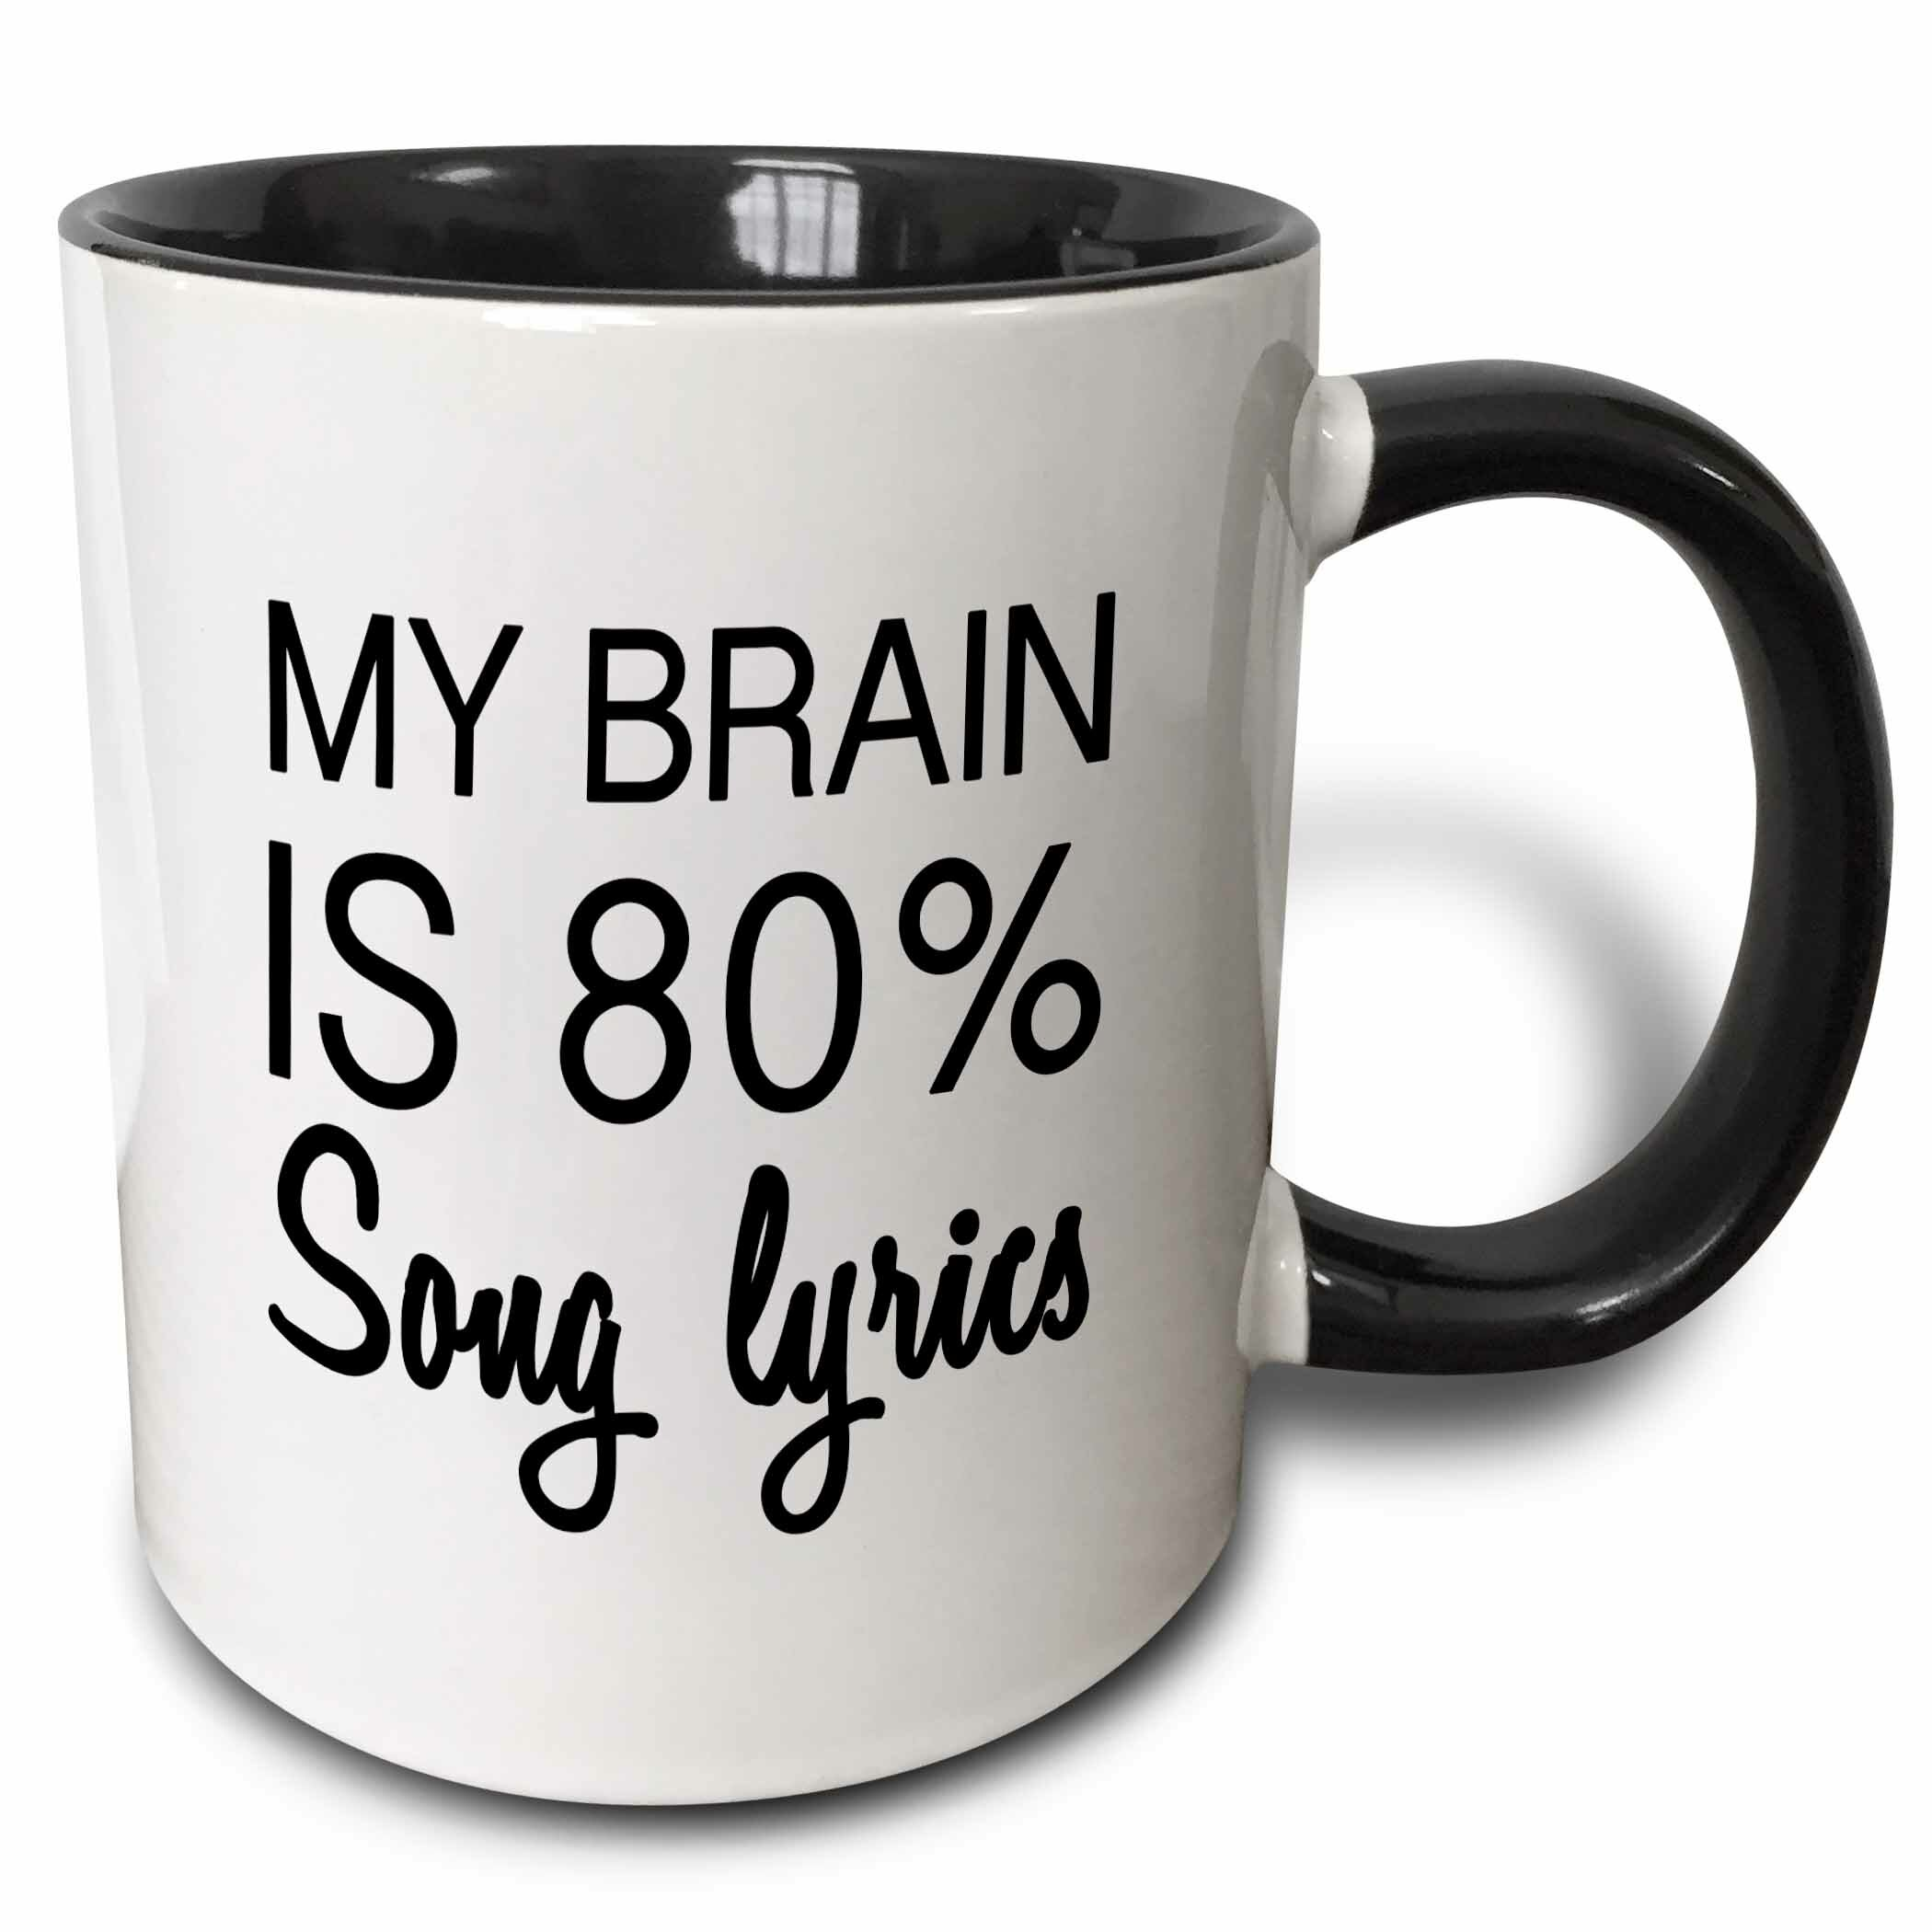 Urban Brain Song Lyrics MugWayfair Percent East Is 80 My Coffee Home 0PknOX8w